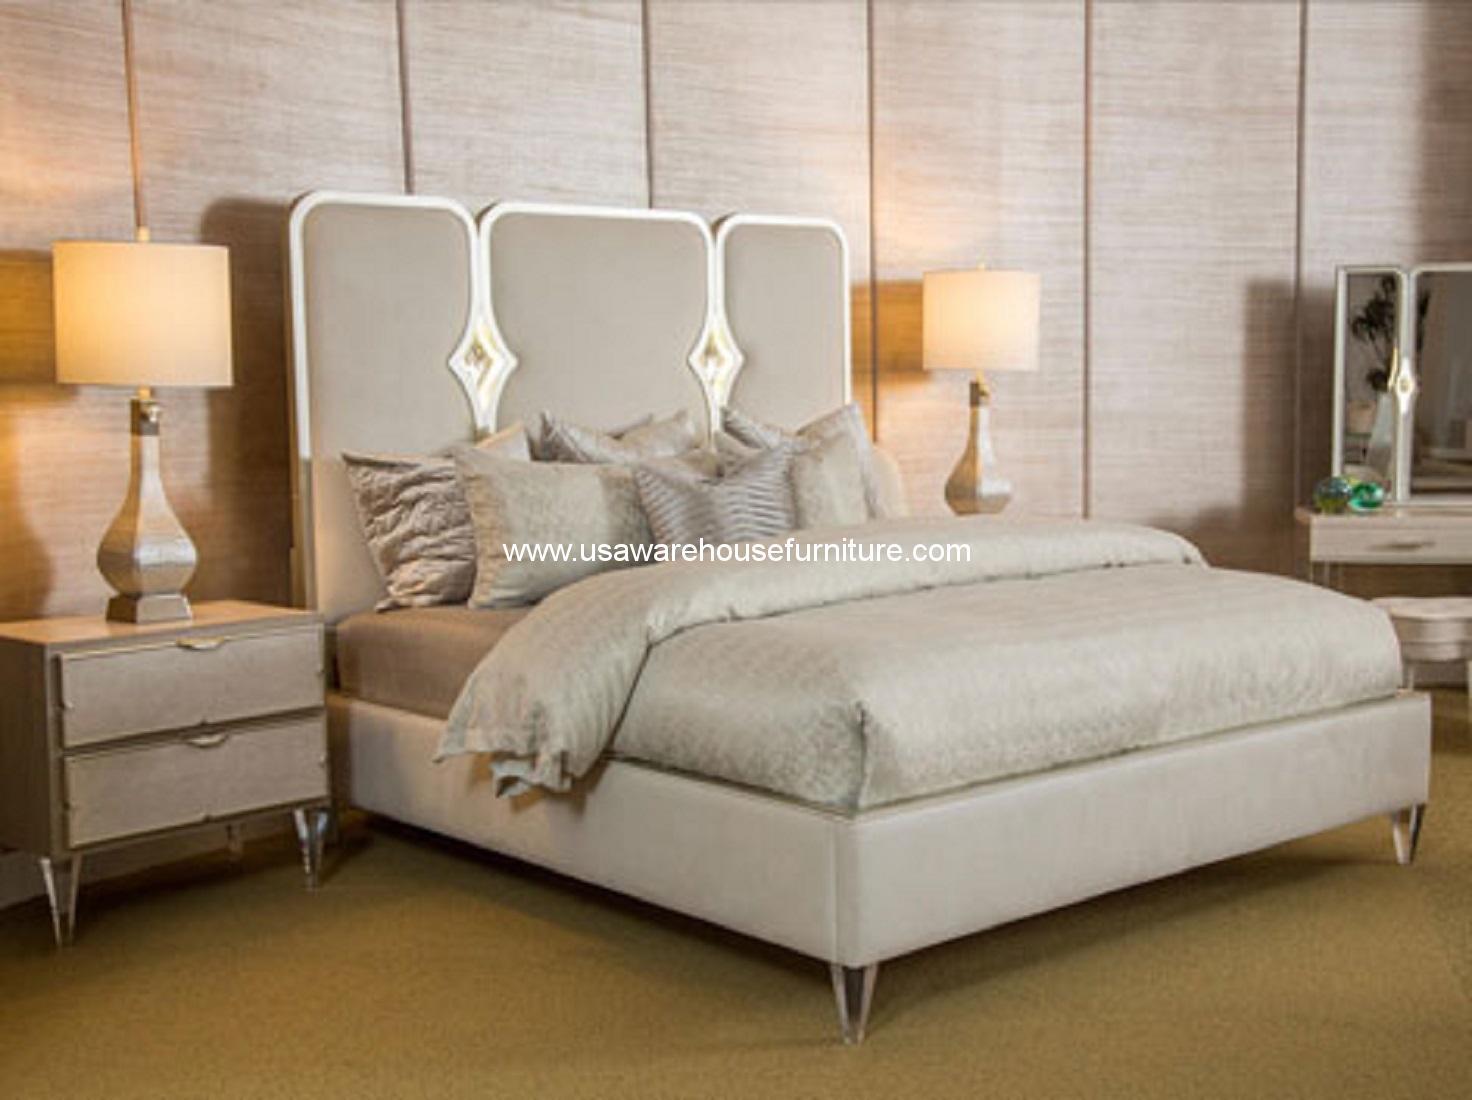 4 Piece Micheal Amini Camden Court Crystal Panel Bedroom Set Usa Warehouse Furniture